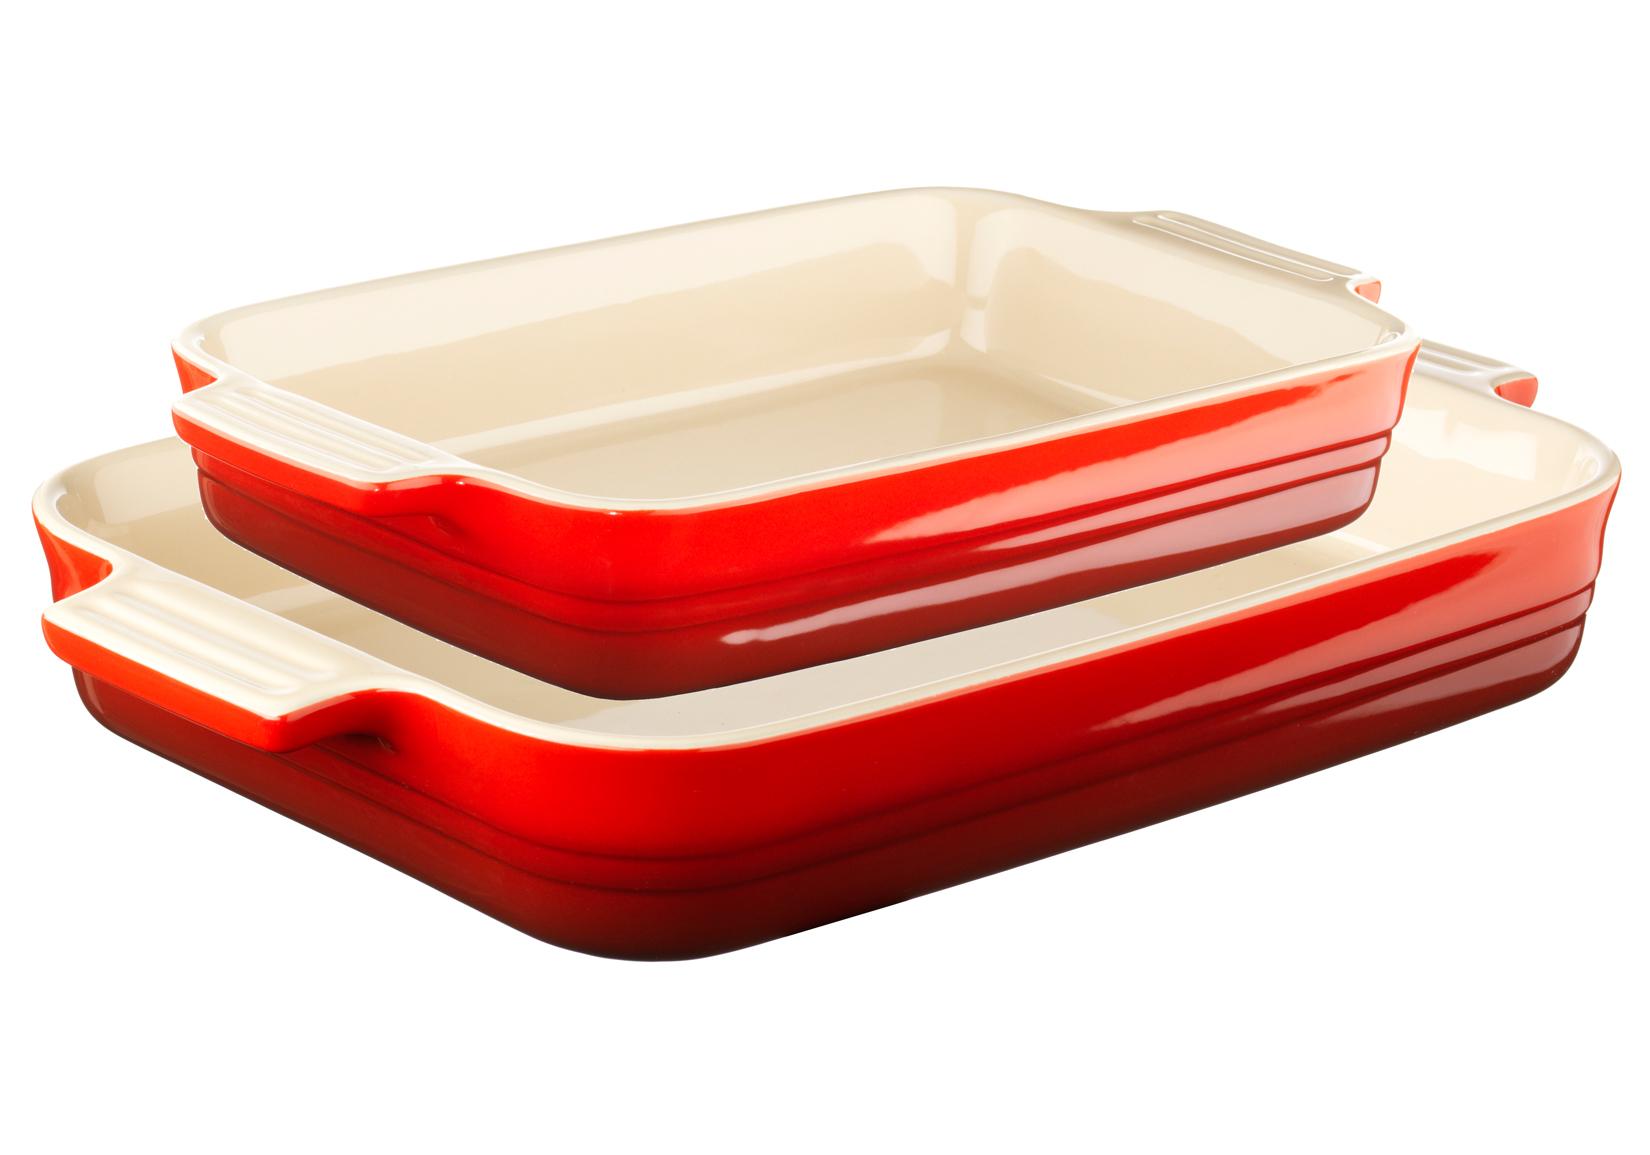 Le Creuset Rektangulär Formset 26 cm & 32 cm Röd